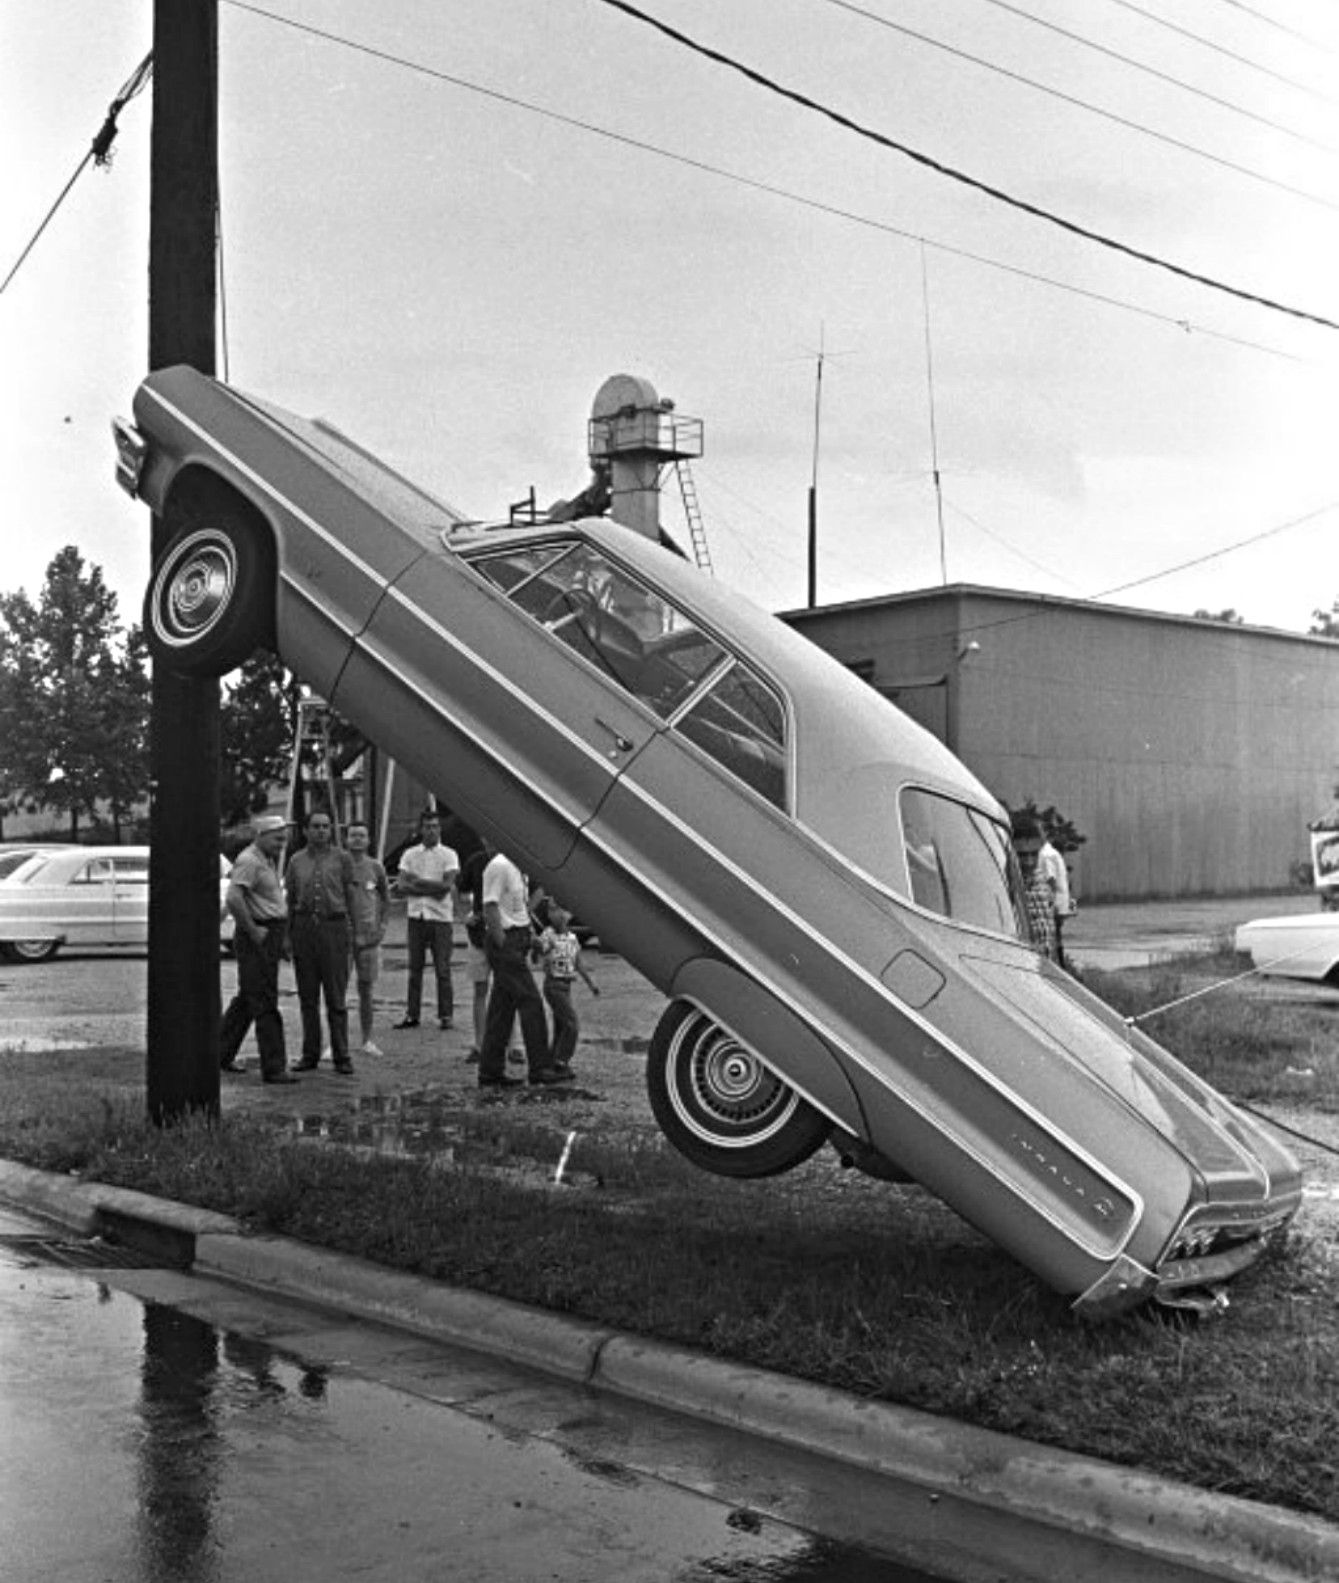 1964 Chevrolet Impala Scene From A Movie Lowrider Cars